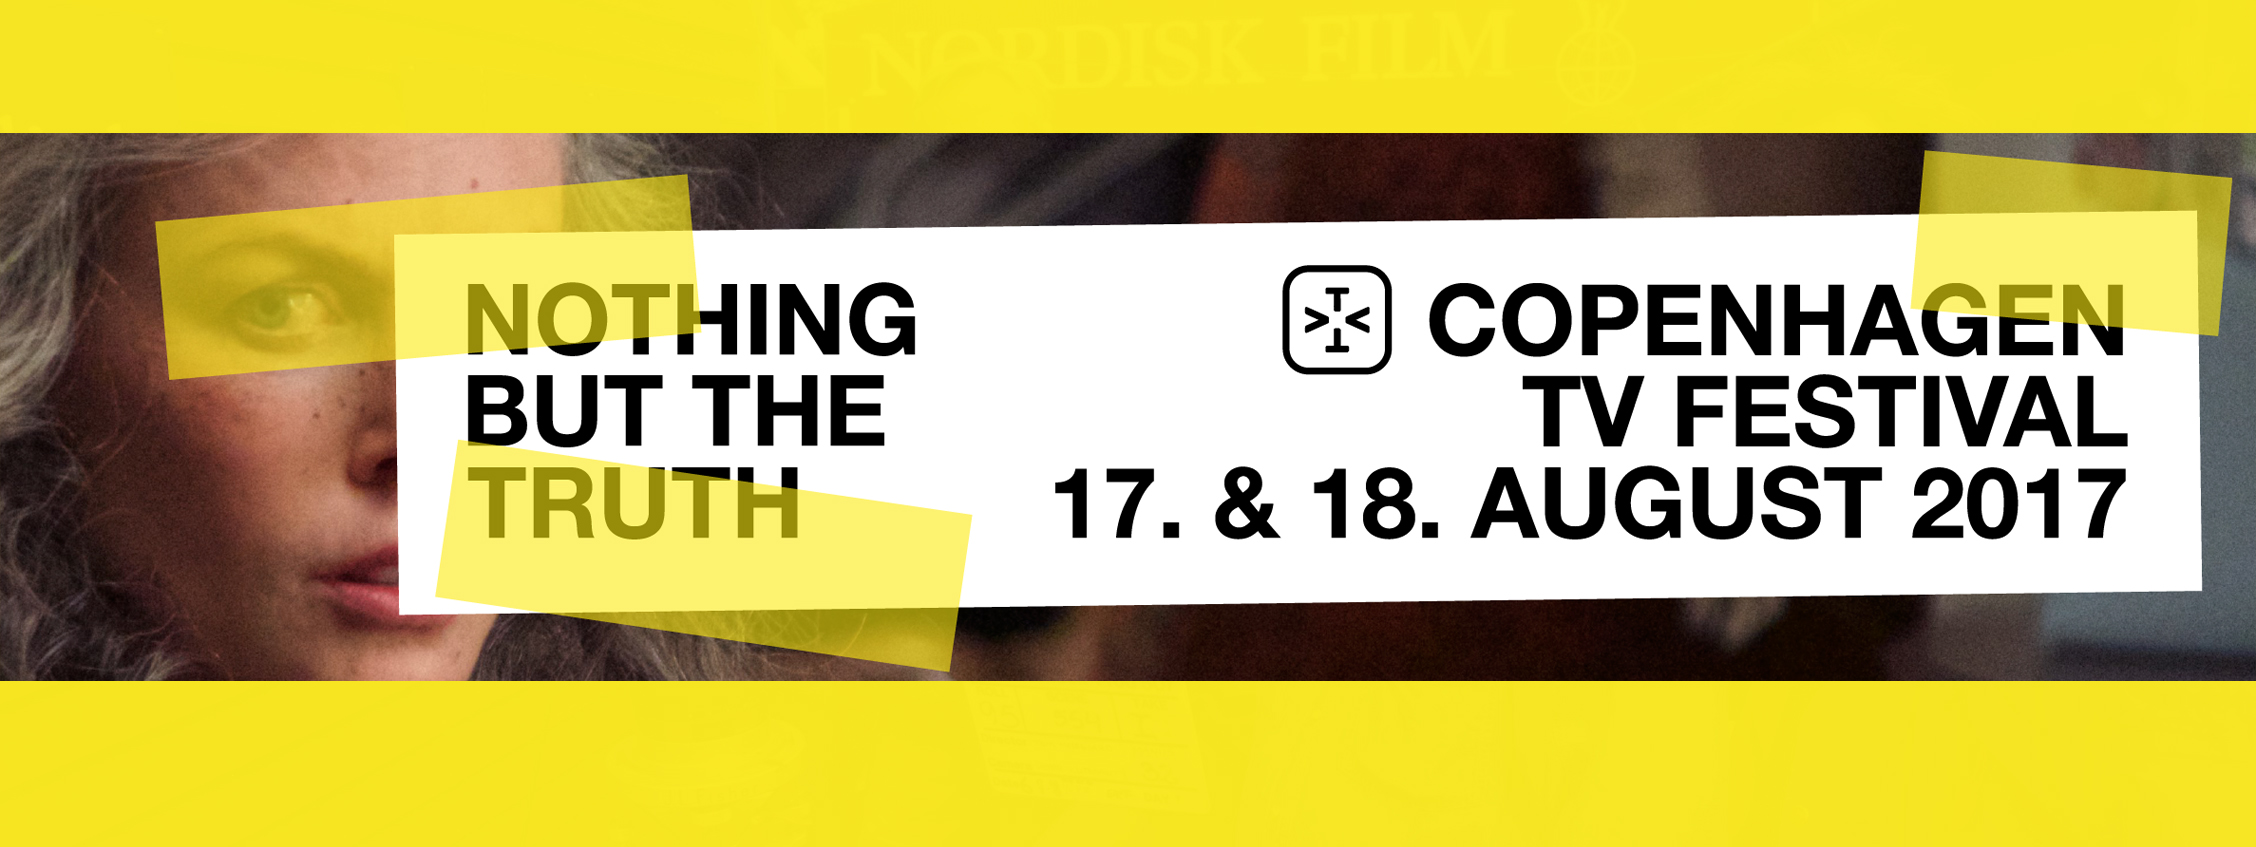 CPH TV-festival 2017